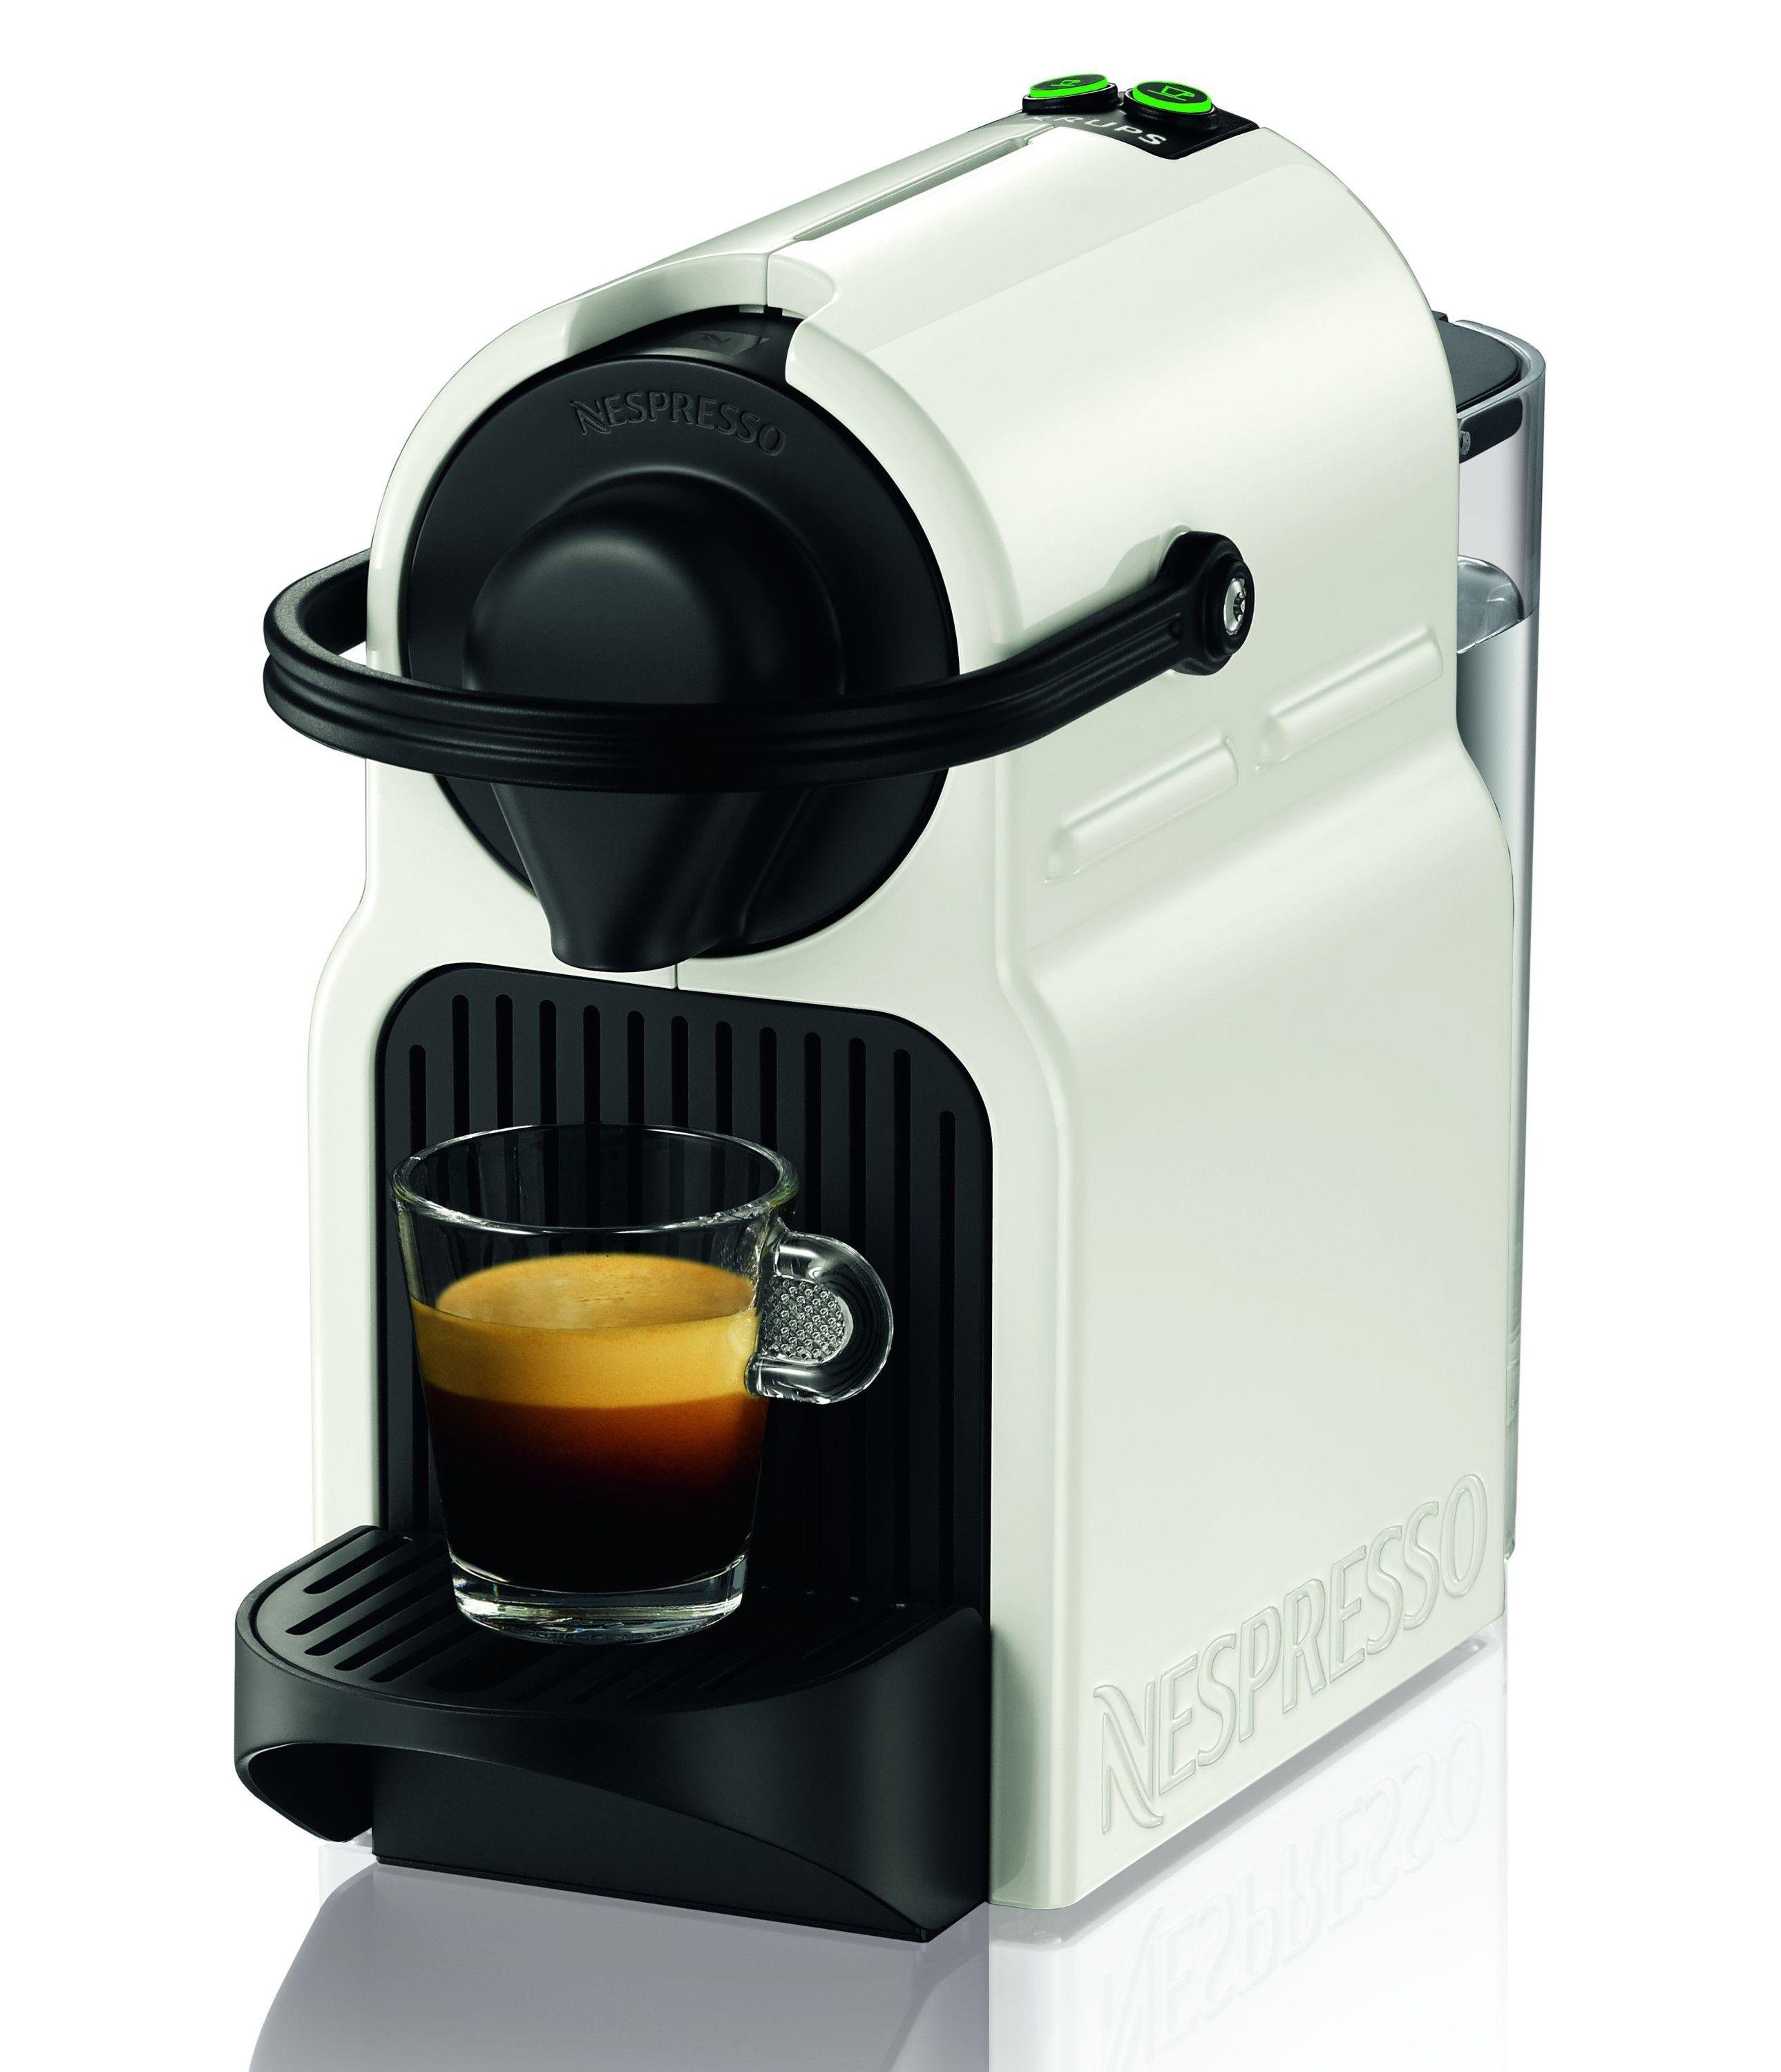 Krups nespresso inissia blanche yy1530fd achat vente machine caf cdiscount - Auchan machine a cafe nespresso ...